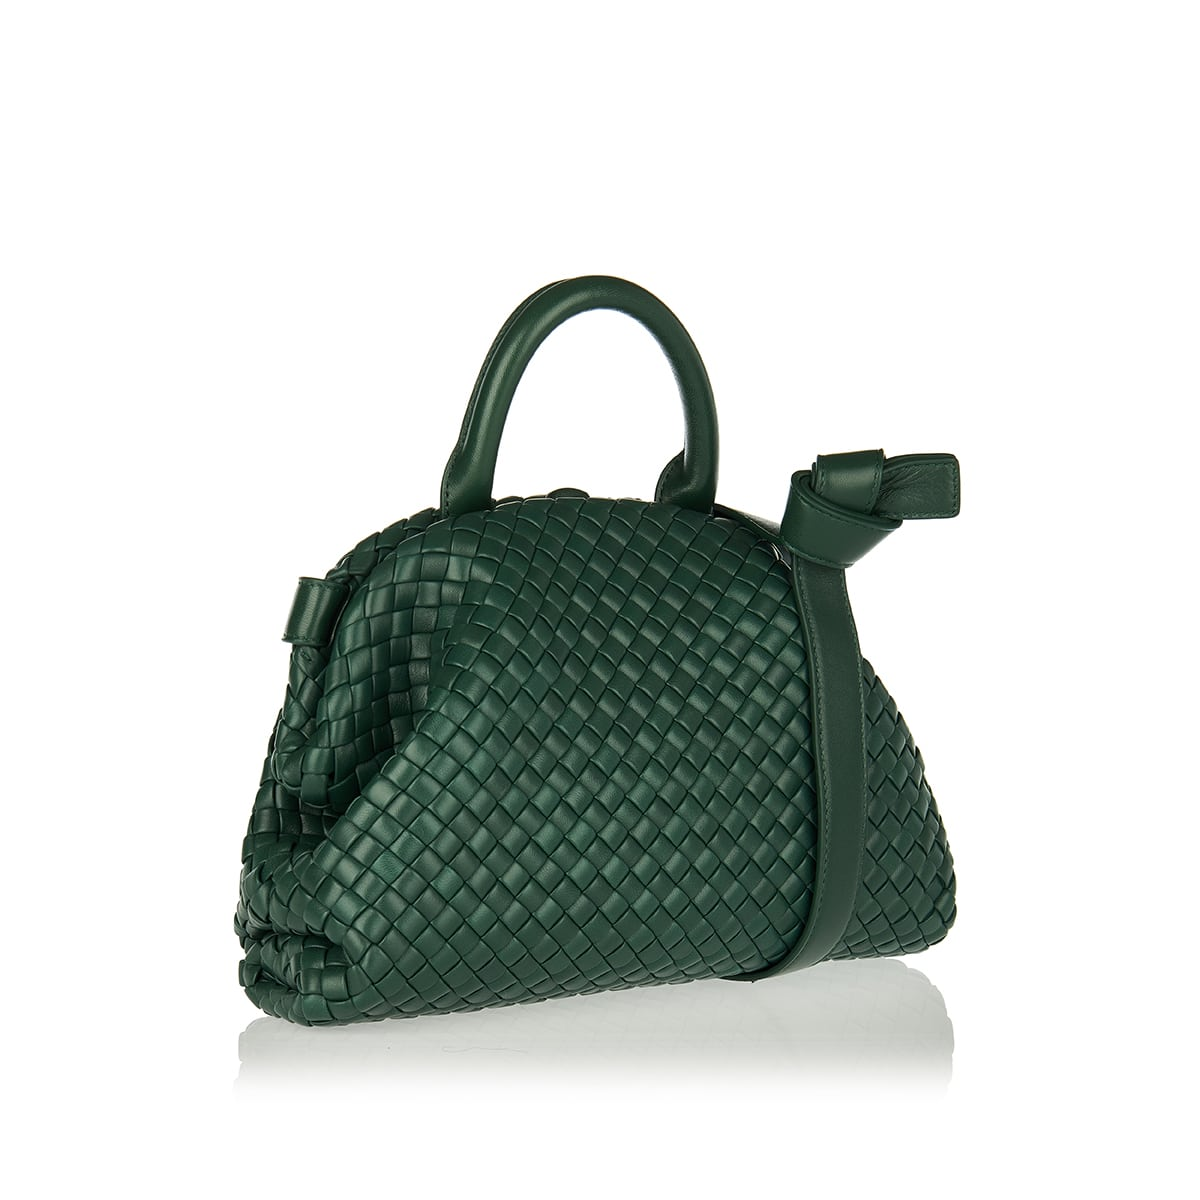 Handle Intreccio leather bag